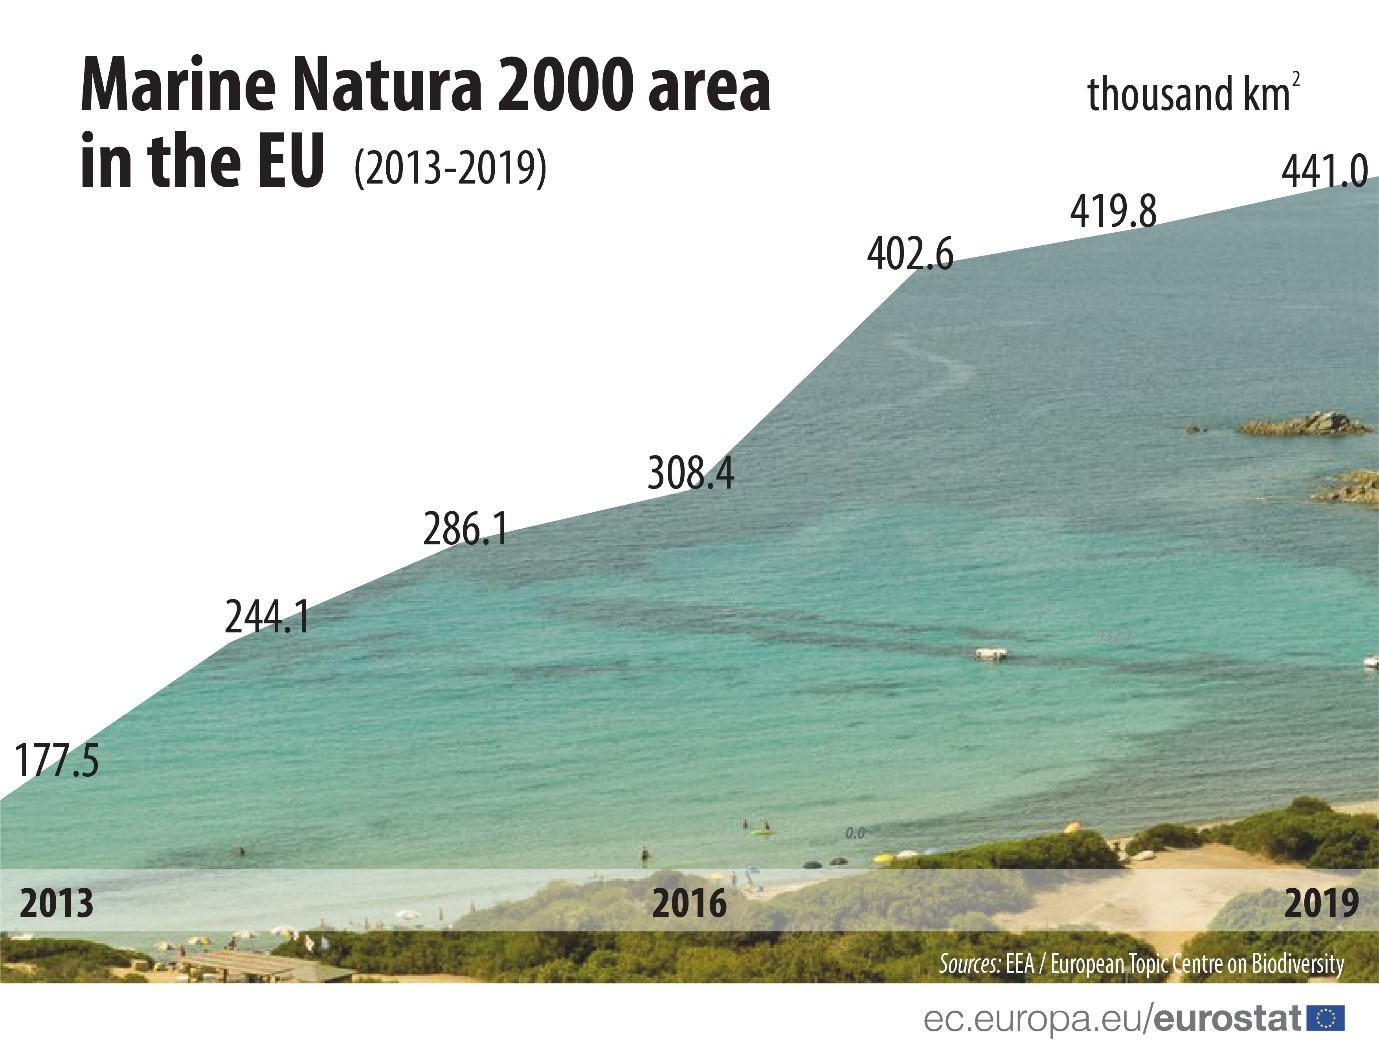 Marine Natura 2000 area in the EU (2013-2019)